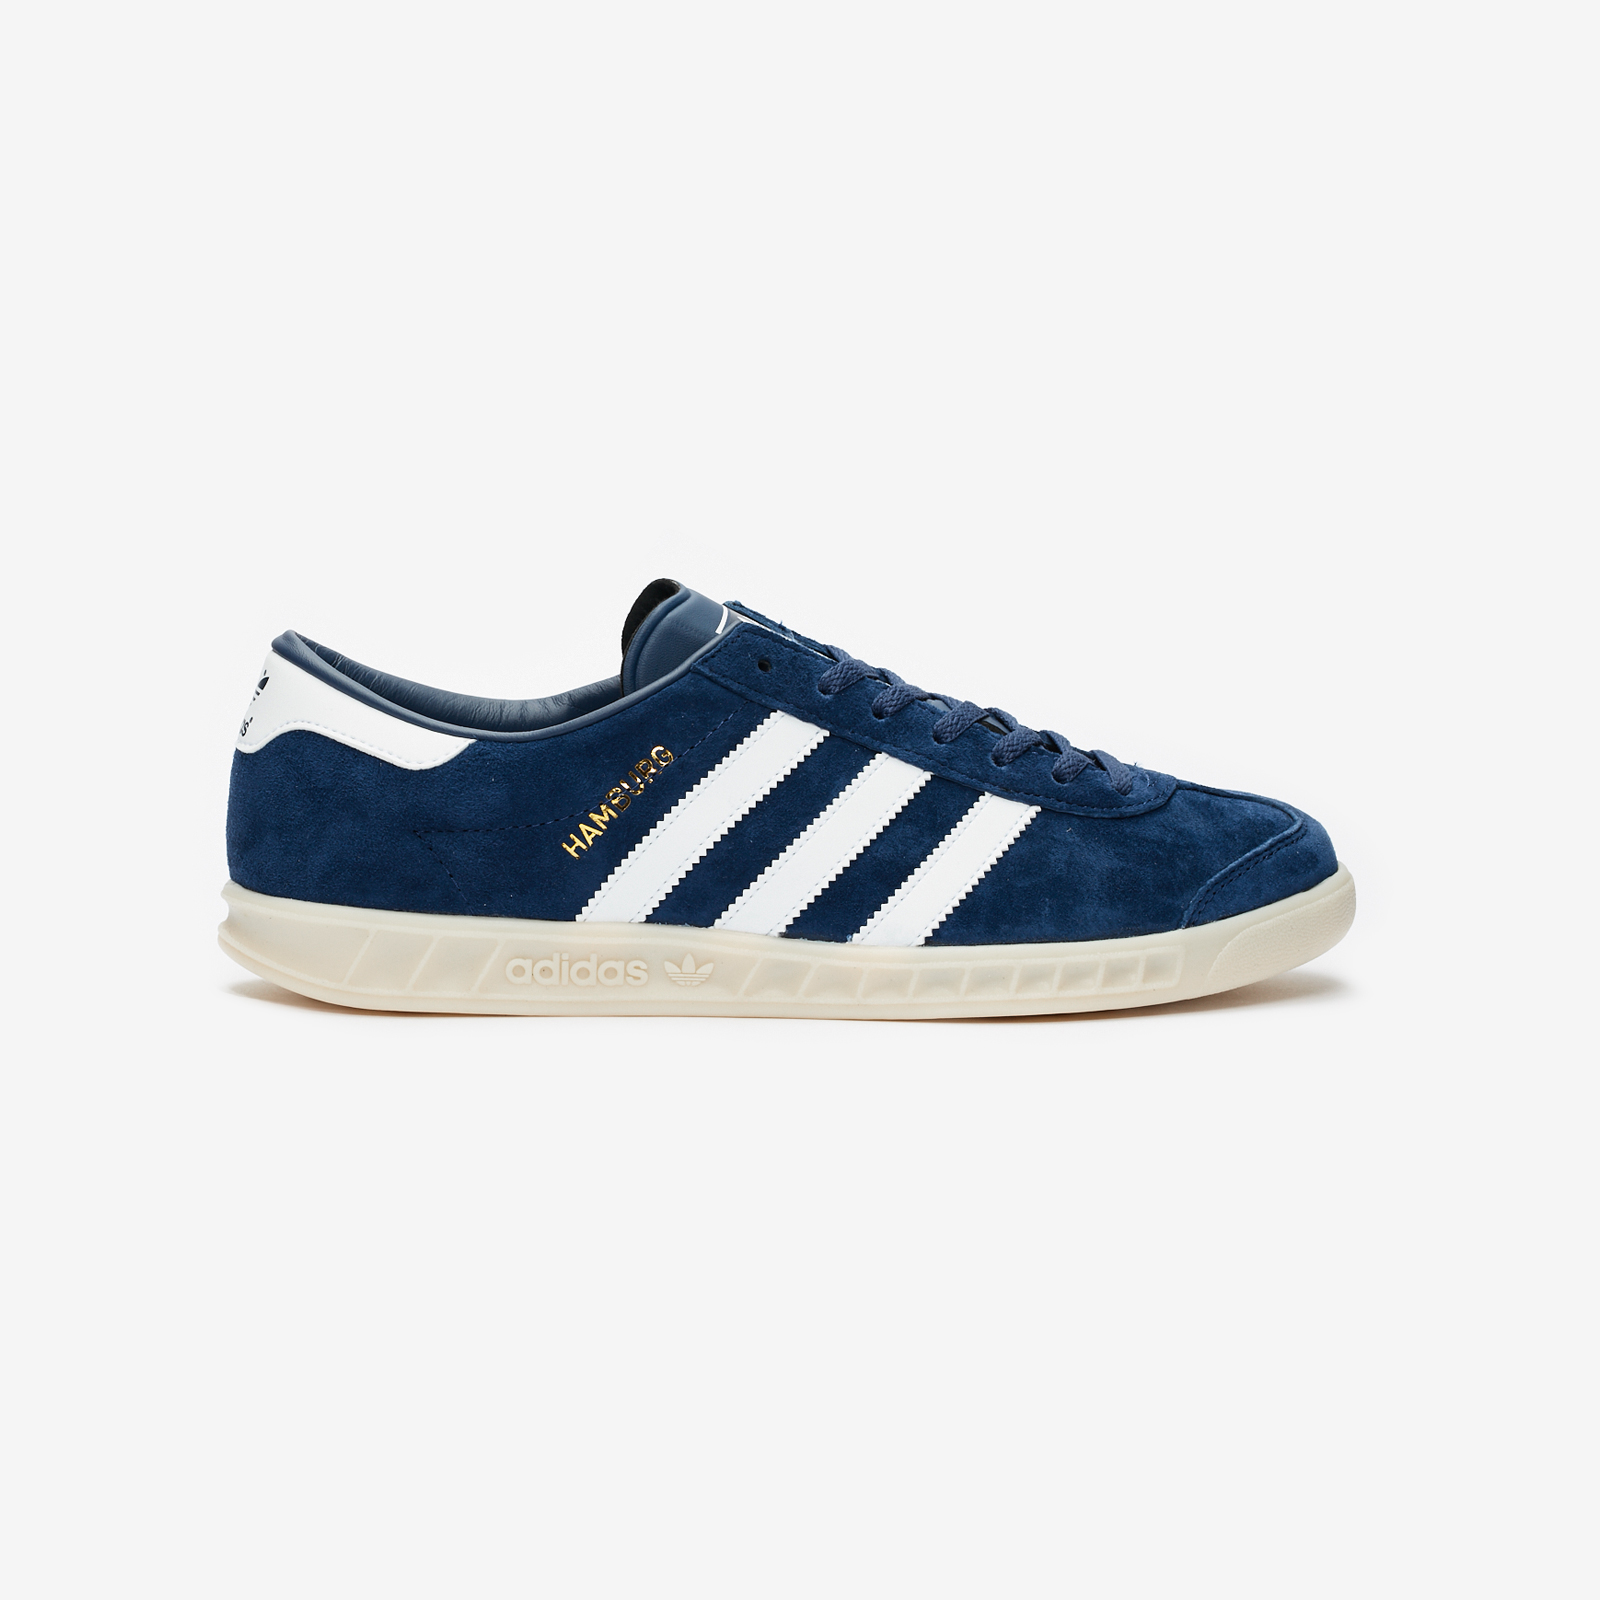 adidas Hamburg - Ef5788 - SNS | sneakers & streetwear online since ...